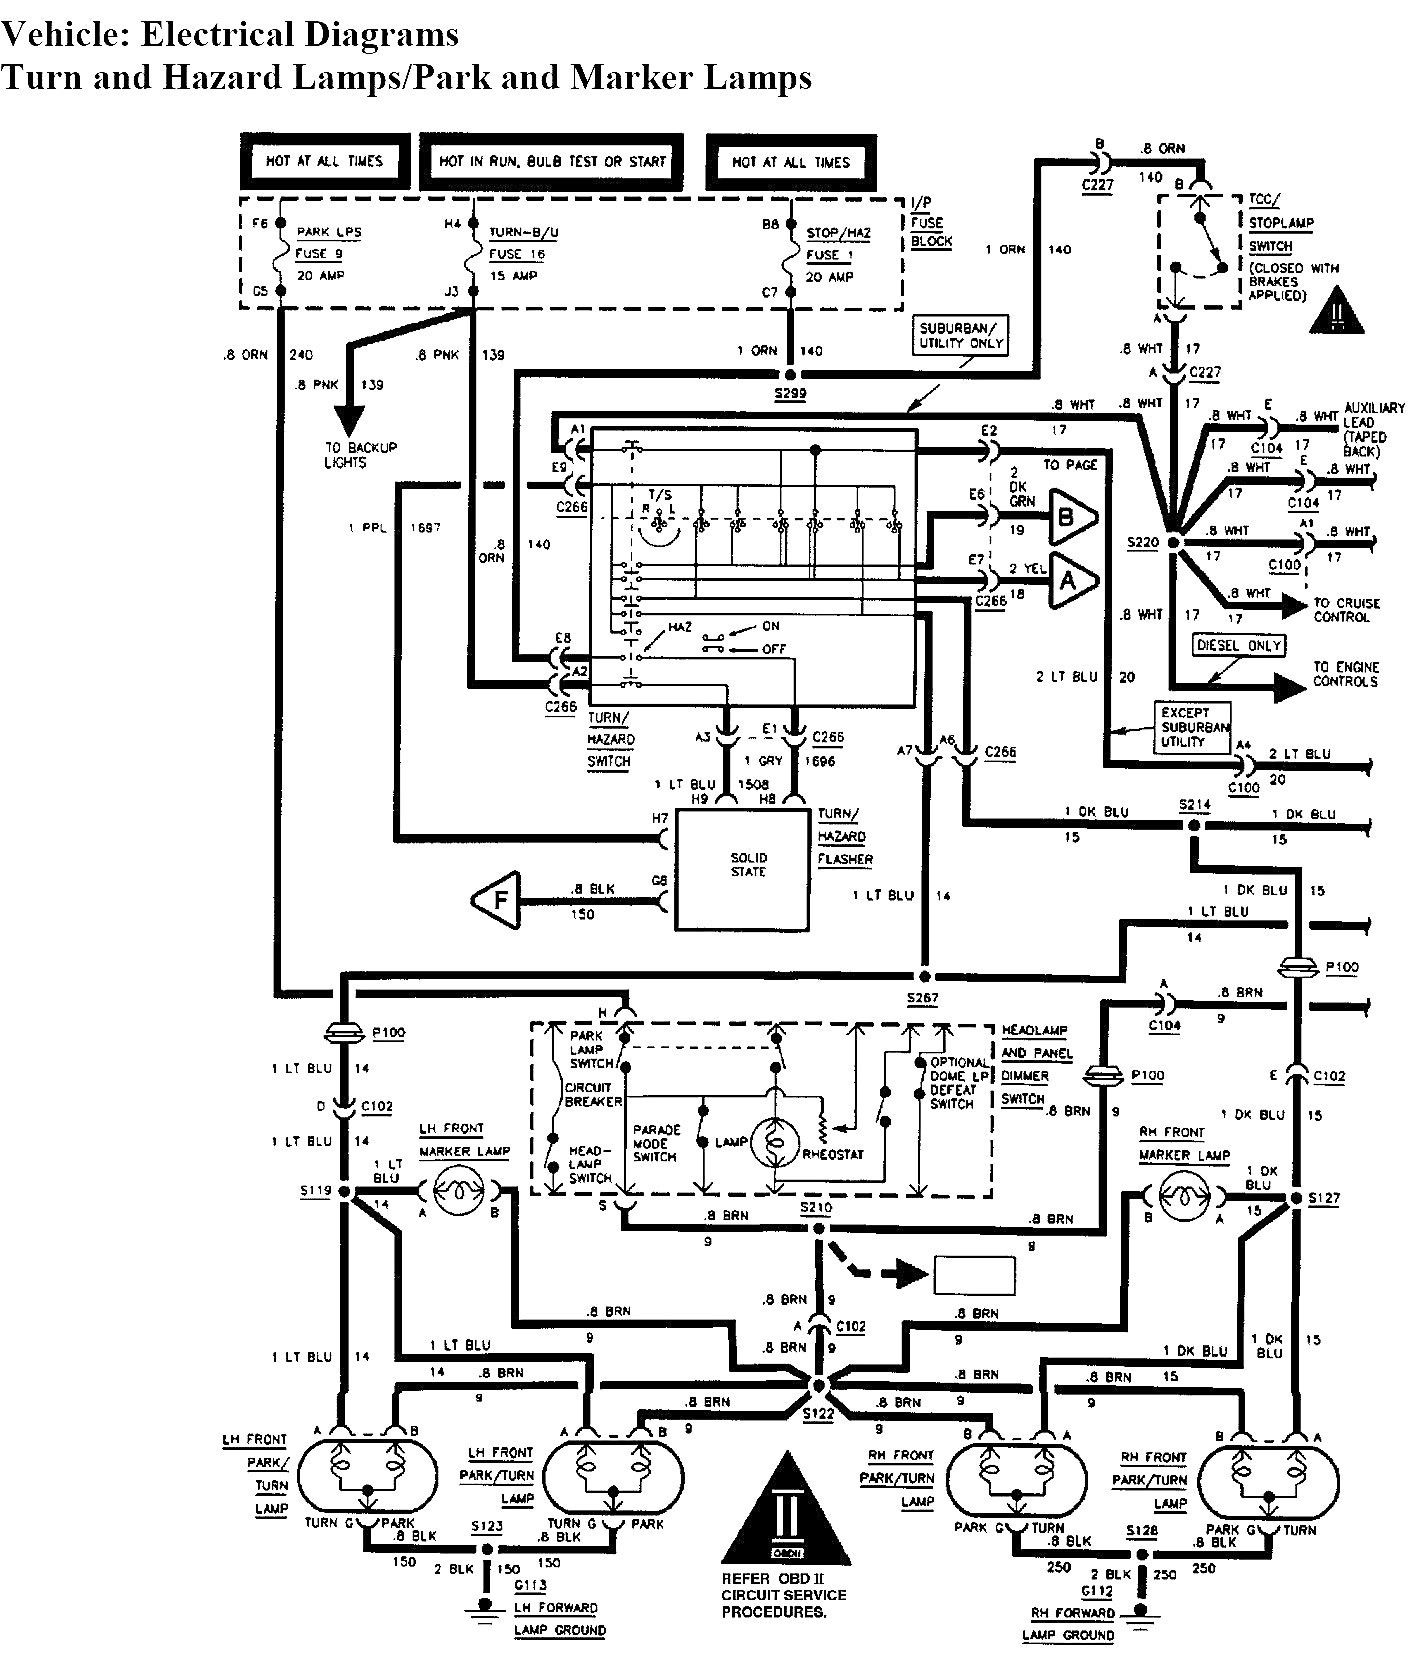 2000 Chevy Silverado Brake Light Wiring Diagram In 2020 2000 Chevy Silverado Chevy Silverado 79 Chevy Truck